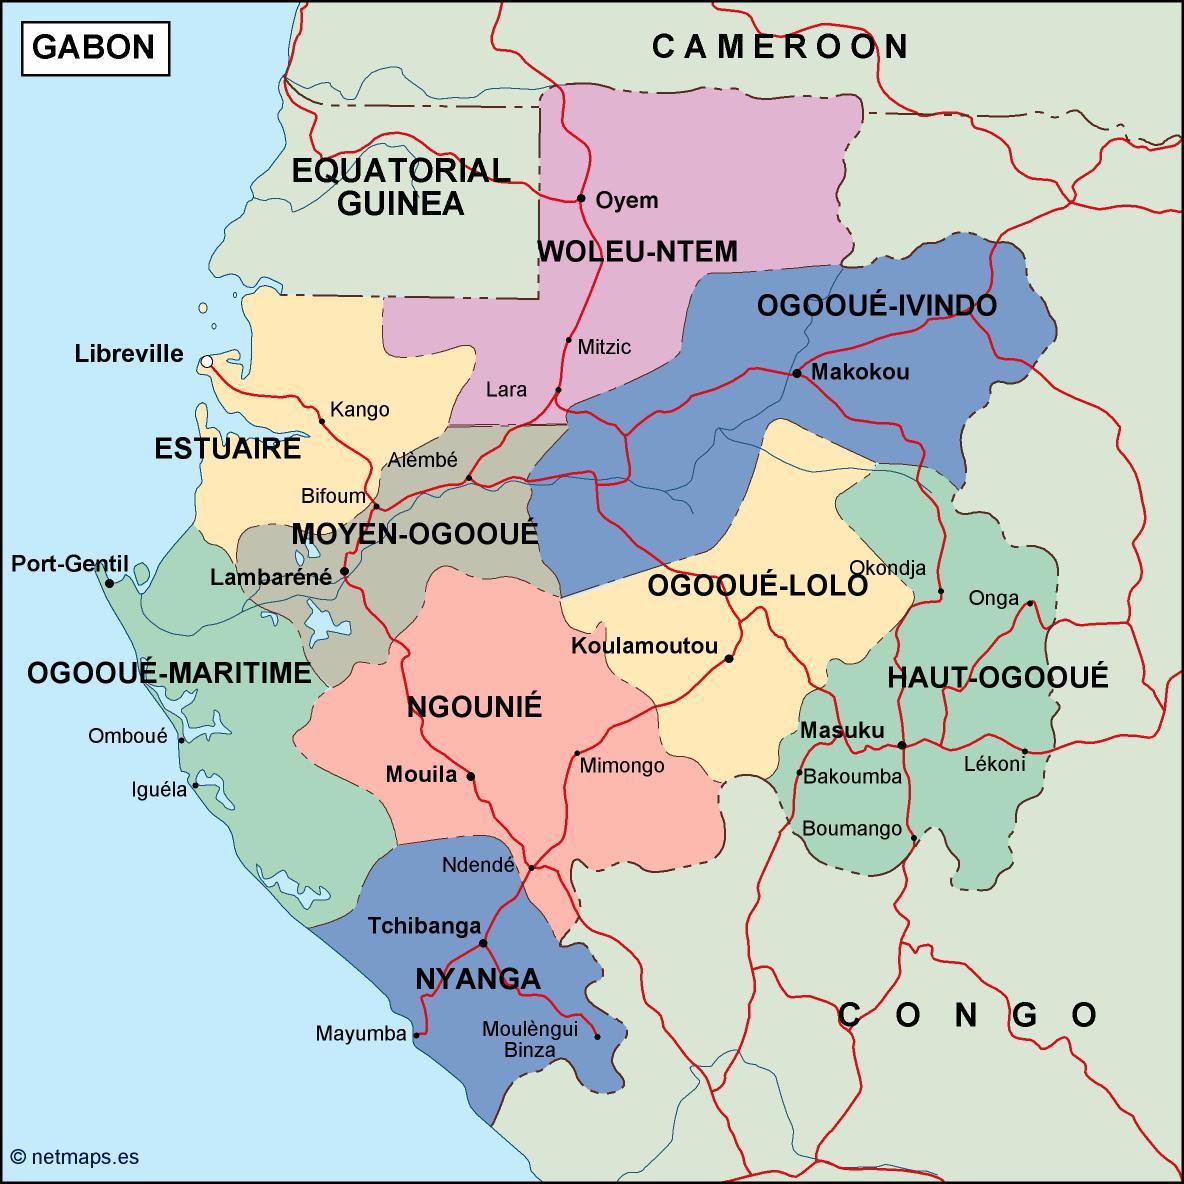 gabon political map on namibia map, spain map, egypt map, haiti map, zaire map, mali map, swaziland map, cape verde map, tunisia map, congo map, botswana map, niger map, mozambique map, algeria map, angola map, french map, africa map, morocco map, bangladesh map, libreville map, sudan map, kenya map, ethiopia map, libya map, grenada map, uganda map, madagascar map, senegal map, the gambia map, liberia map, rwanda map, republique centrafricaine map, chad map, ghana map, malawi map, zambia map,